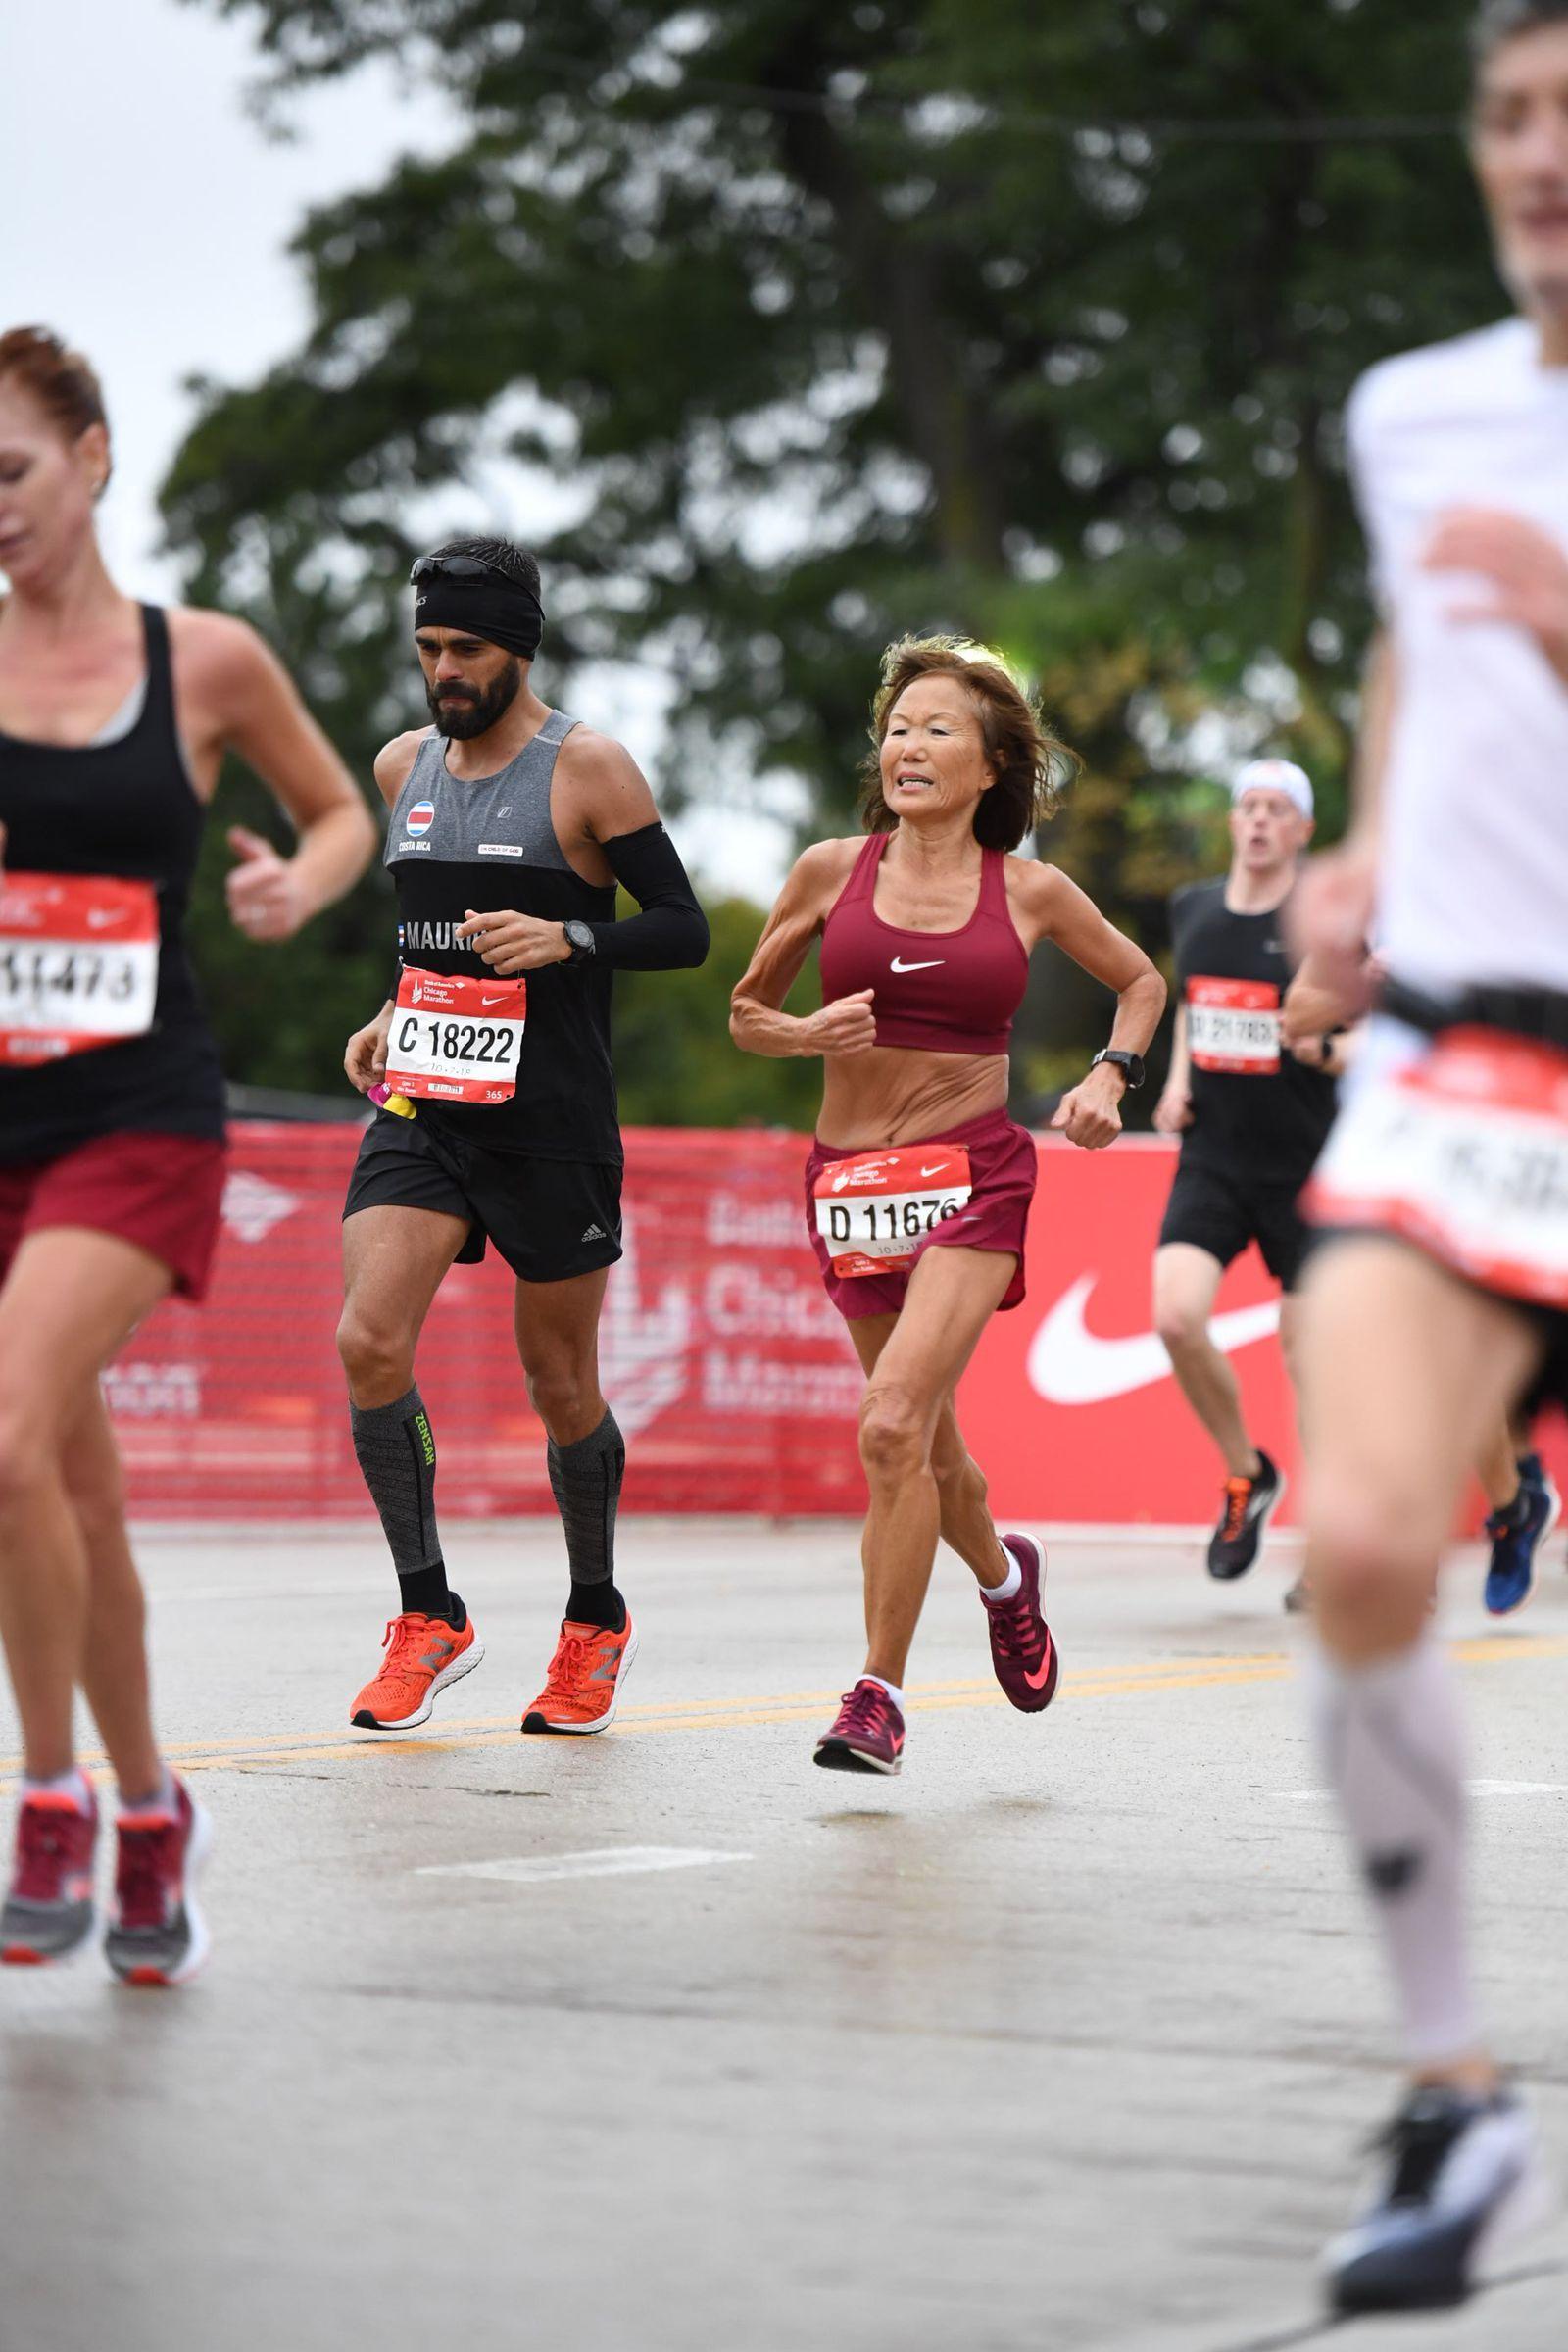 70YearOld Ohio Woman Runs Insanely Fast Marathon in